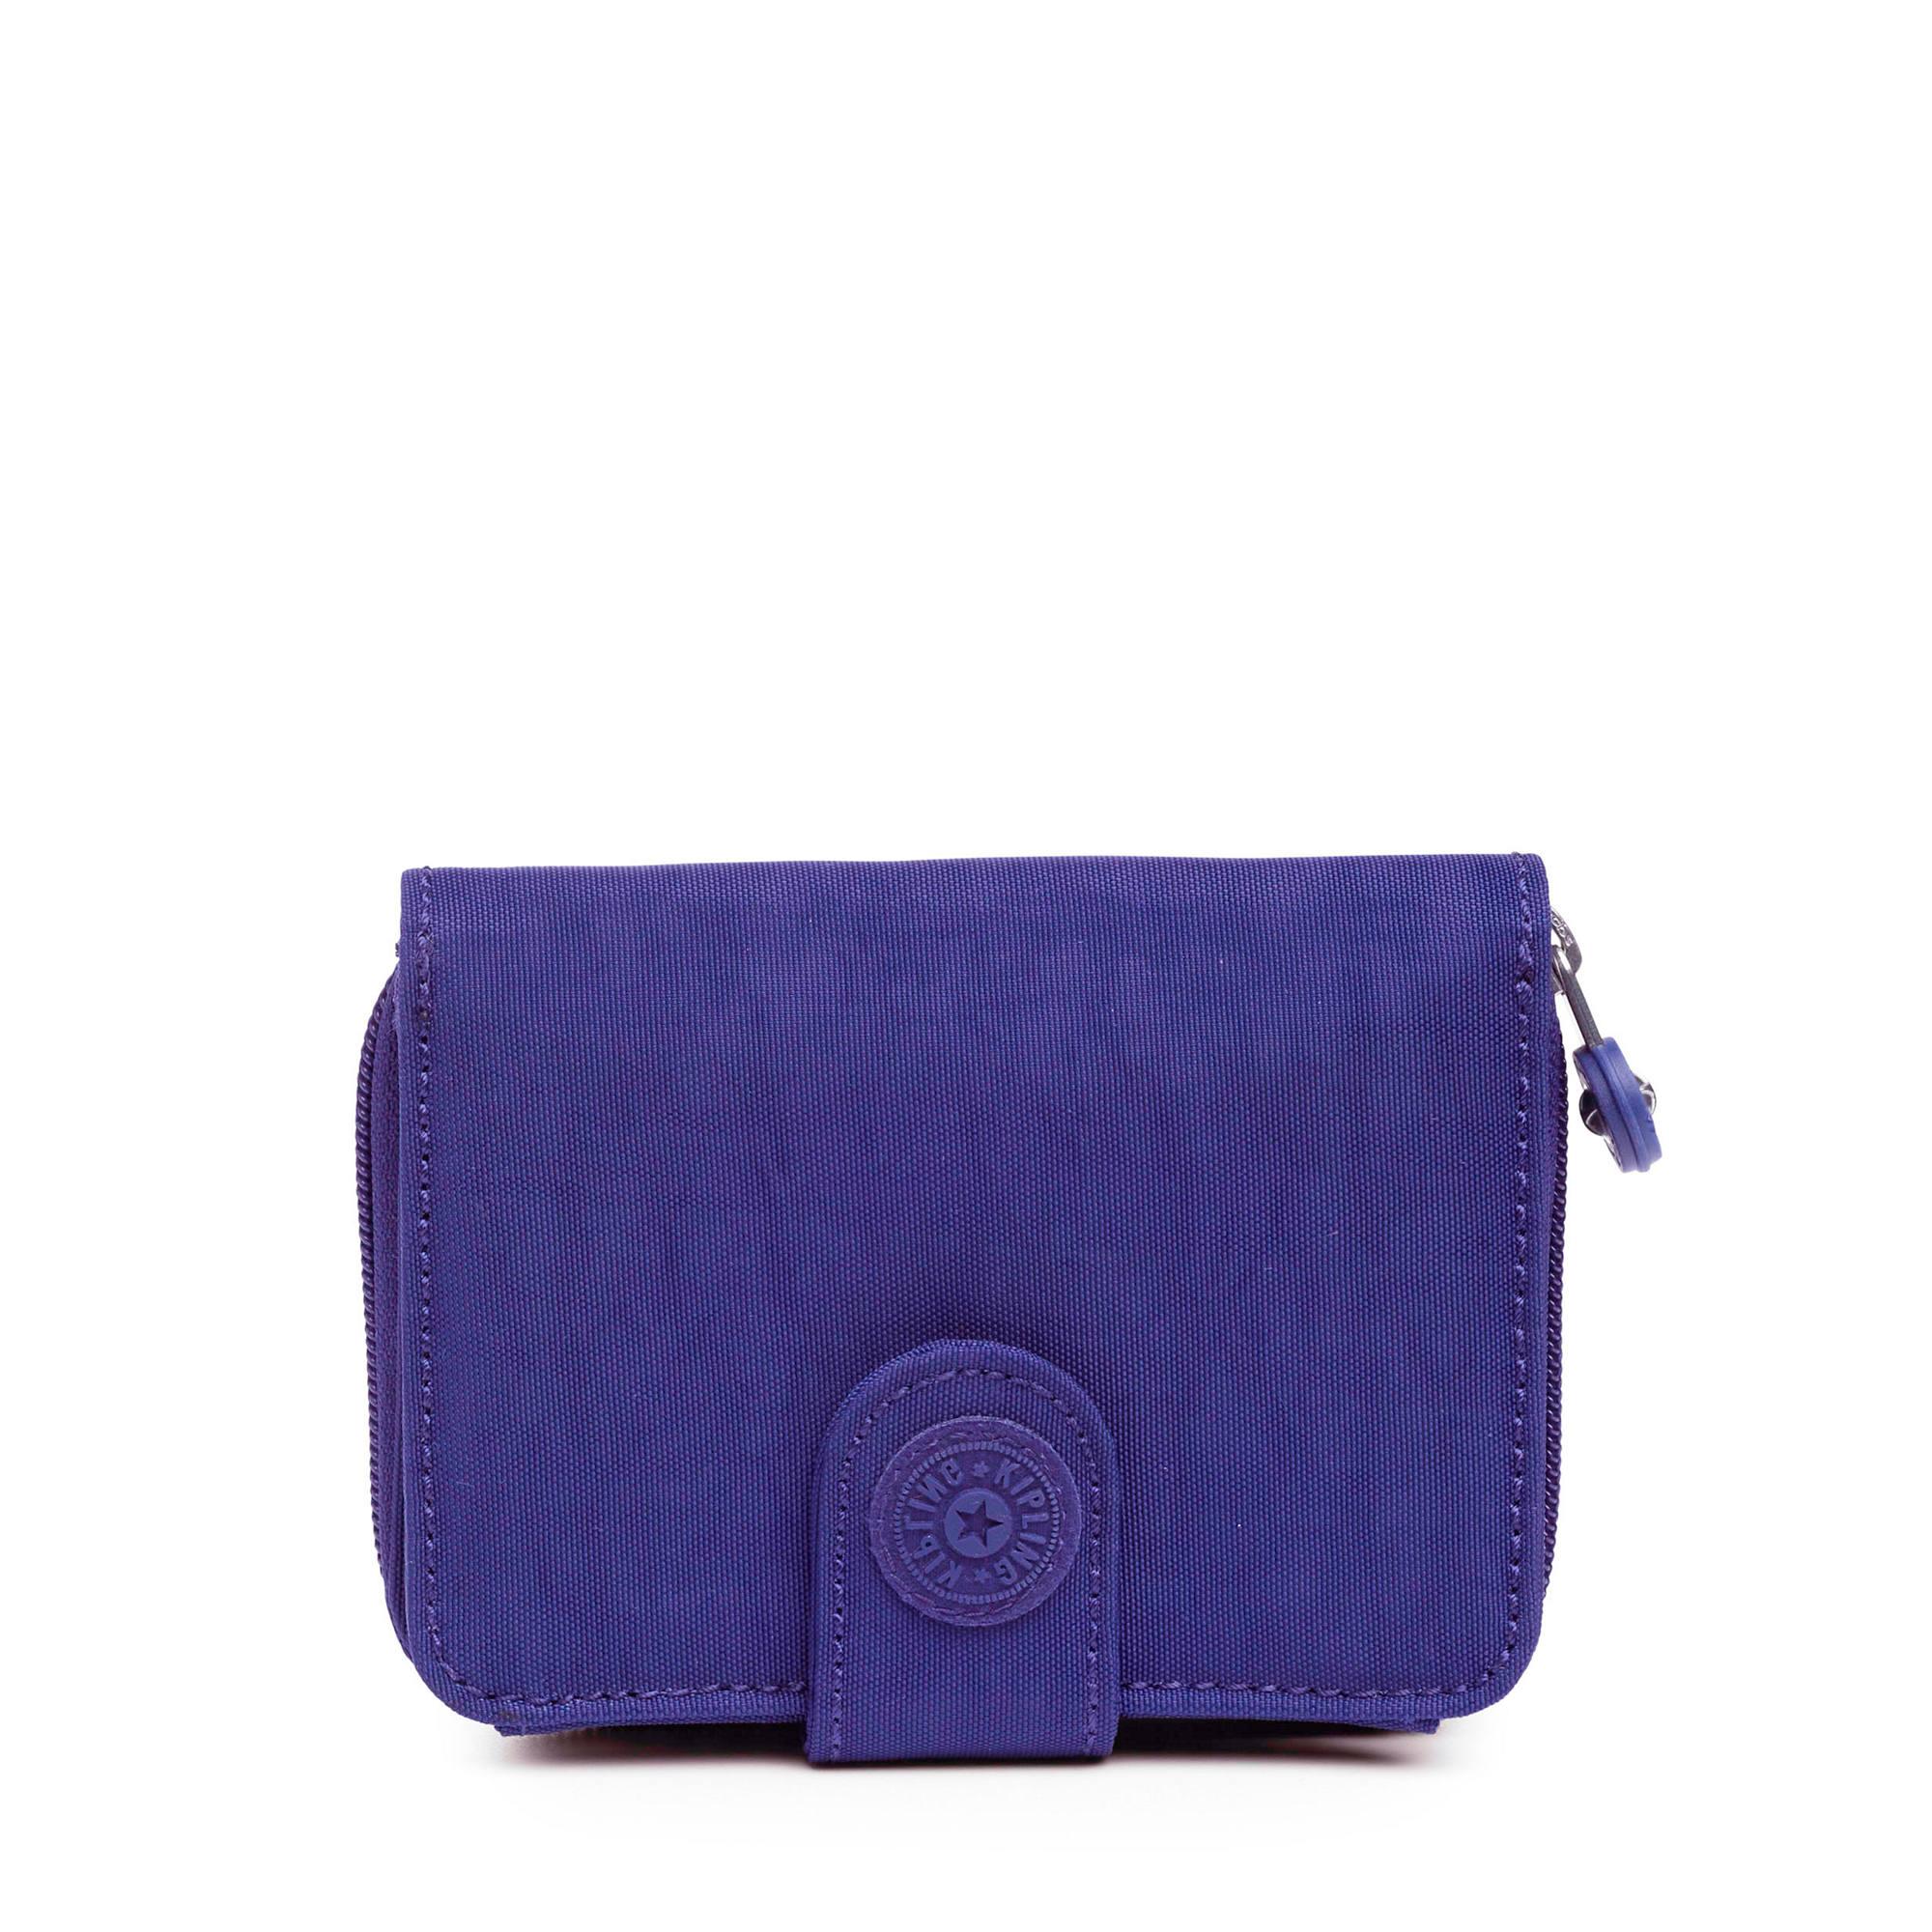 7688174b6b3 Kipling New Money Small Printed Credit Card Wallet | eBay